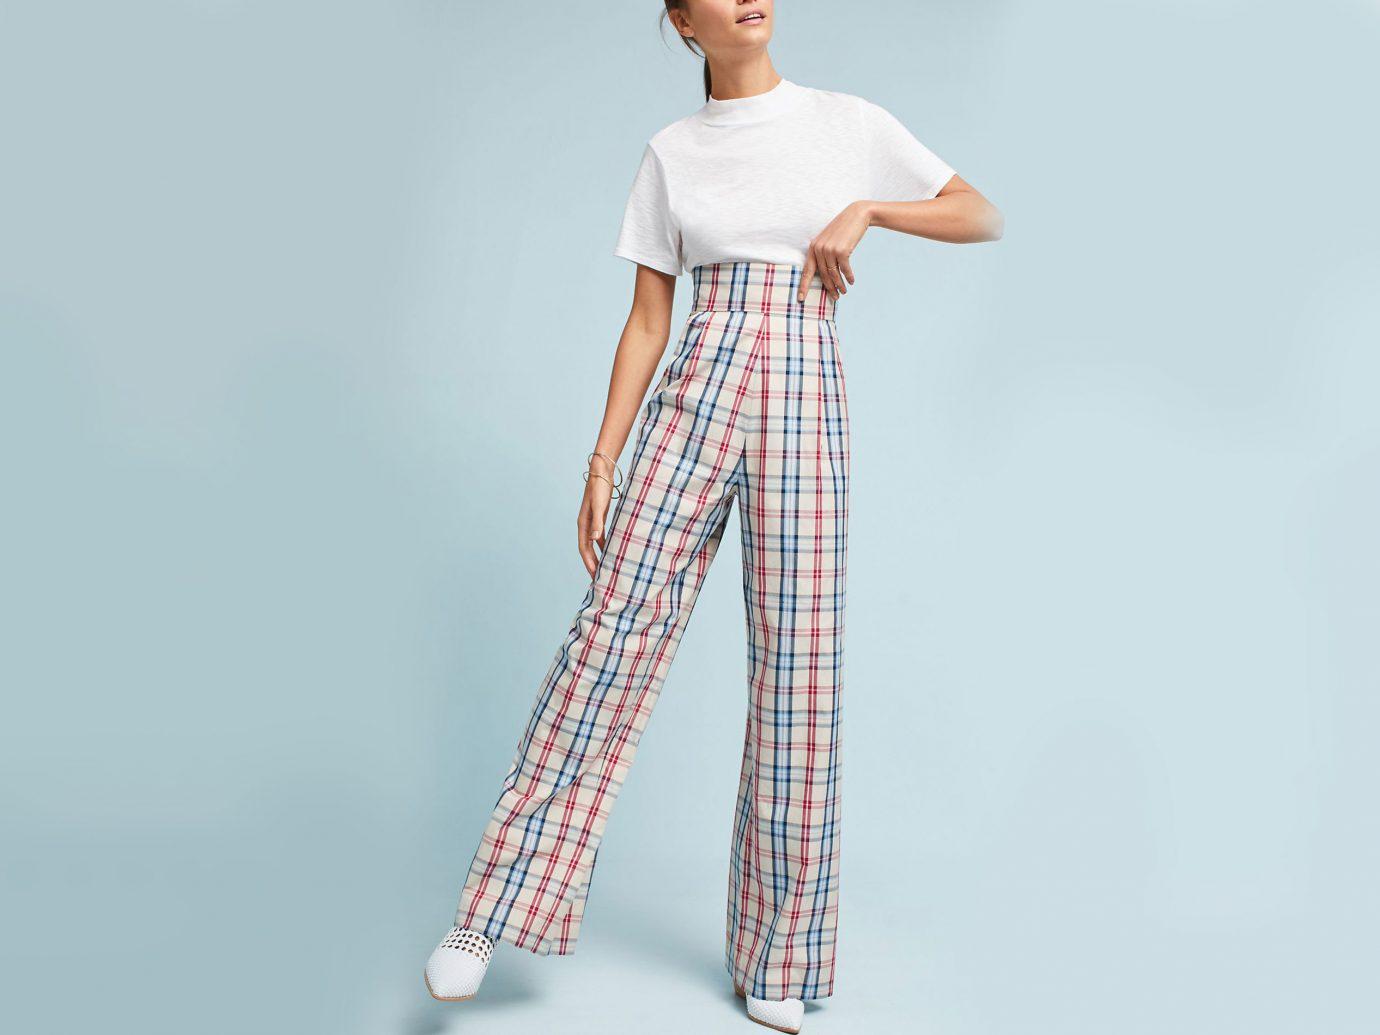 Travel Shop Travel Trends clothing person tartan plaid shoulder joint trunk Design waist fashion model abdomen neck trousers trouser pattern